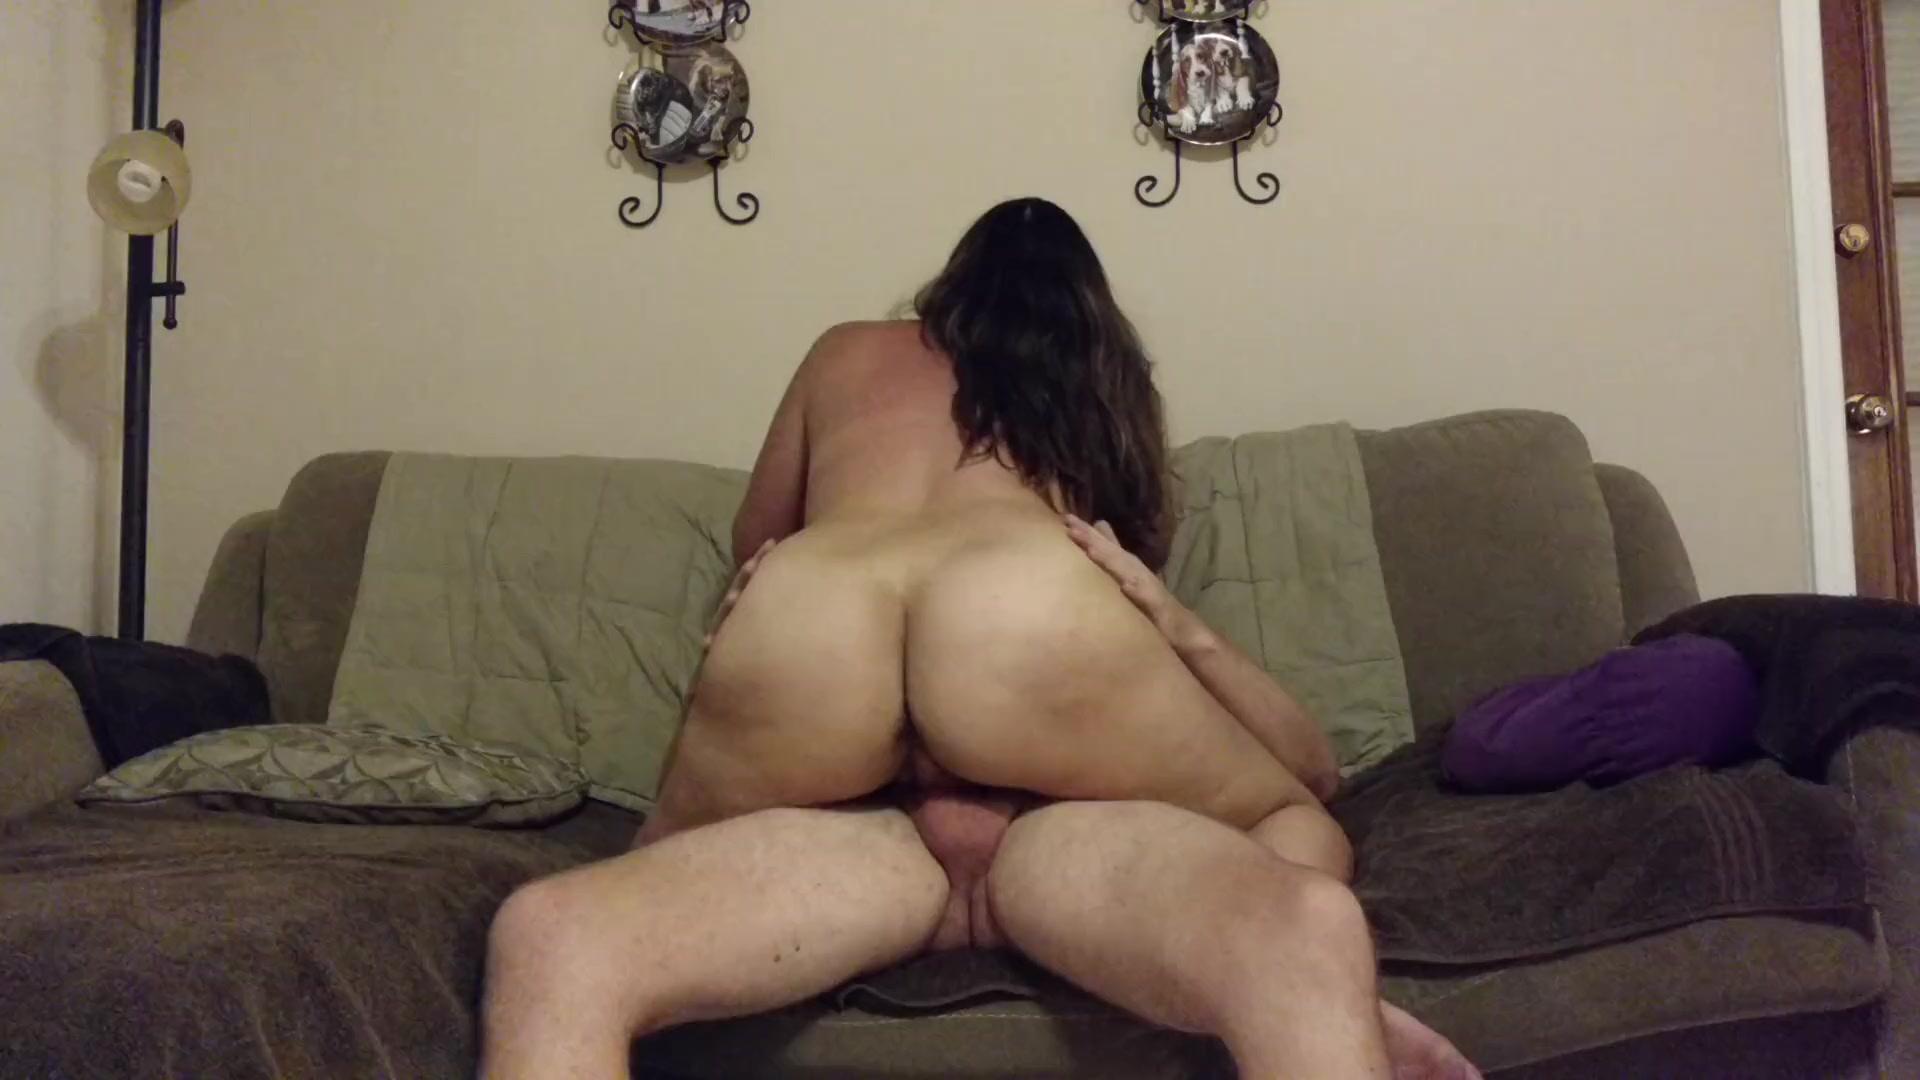 tumblrcom asains girls naked